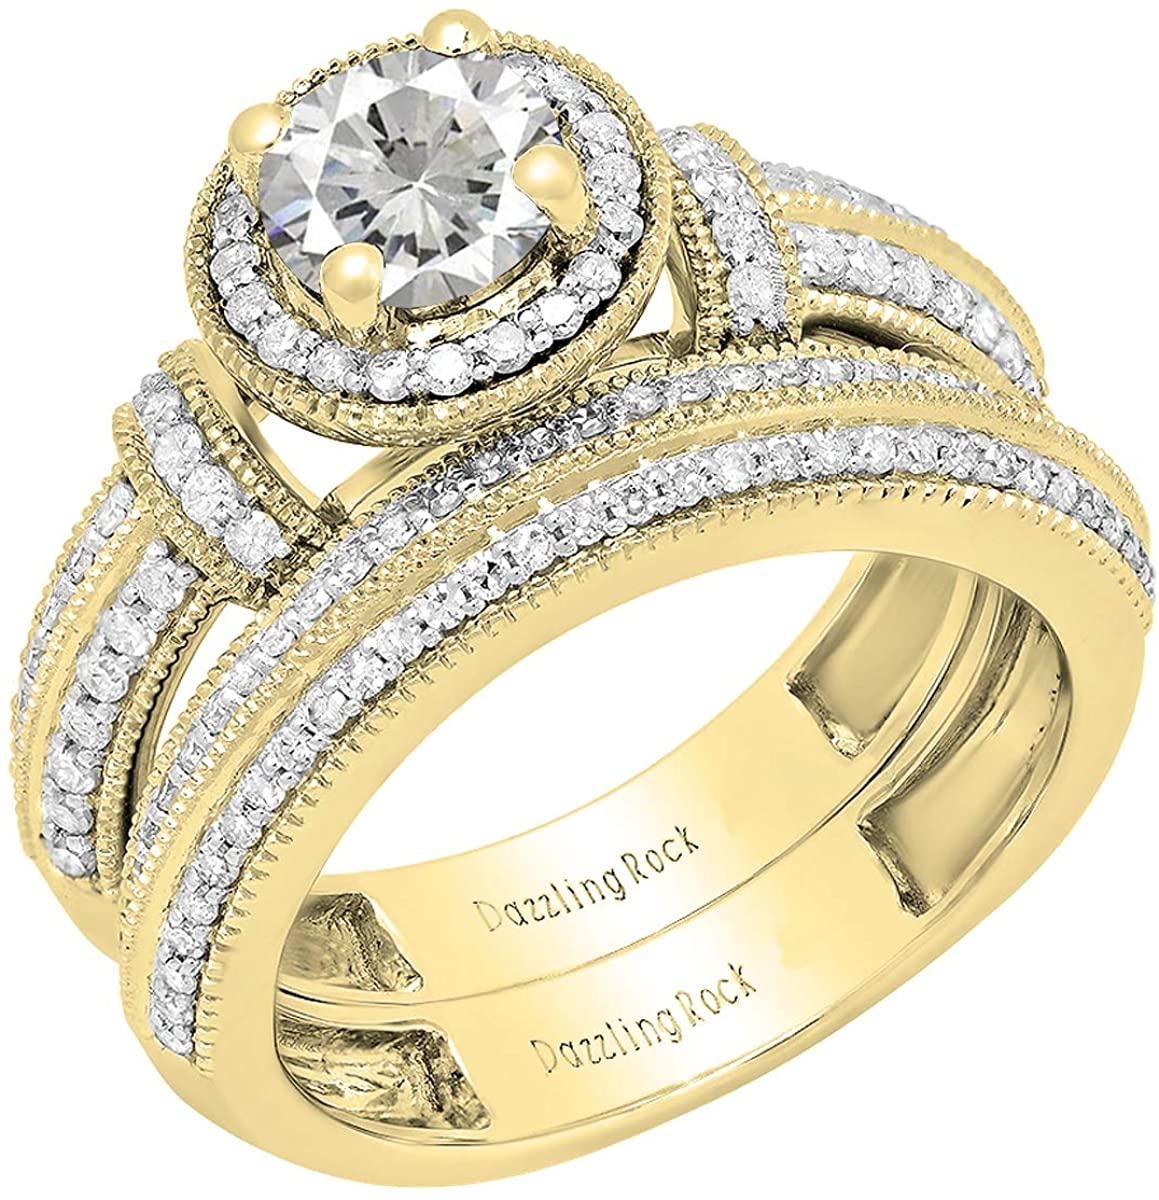 Dazzlingrock Collection 14K 6 MM Round Lab Created Gemstone & Diamond Ladies Engagement Bridal Band Ring Set, Yellow Gold